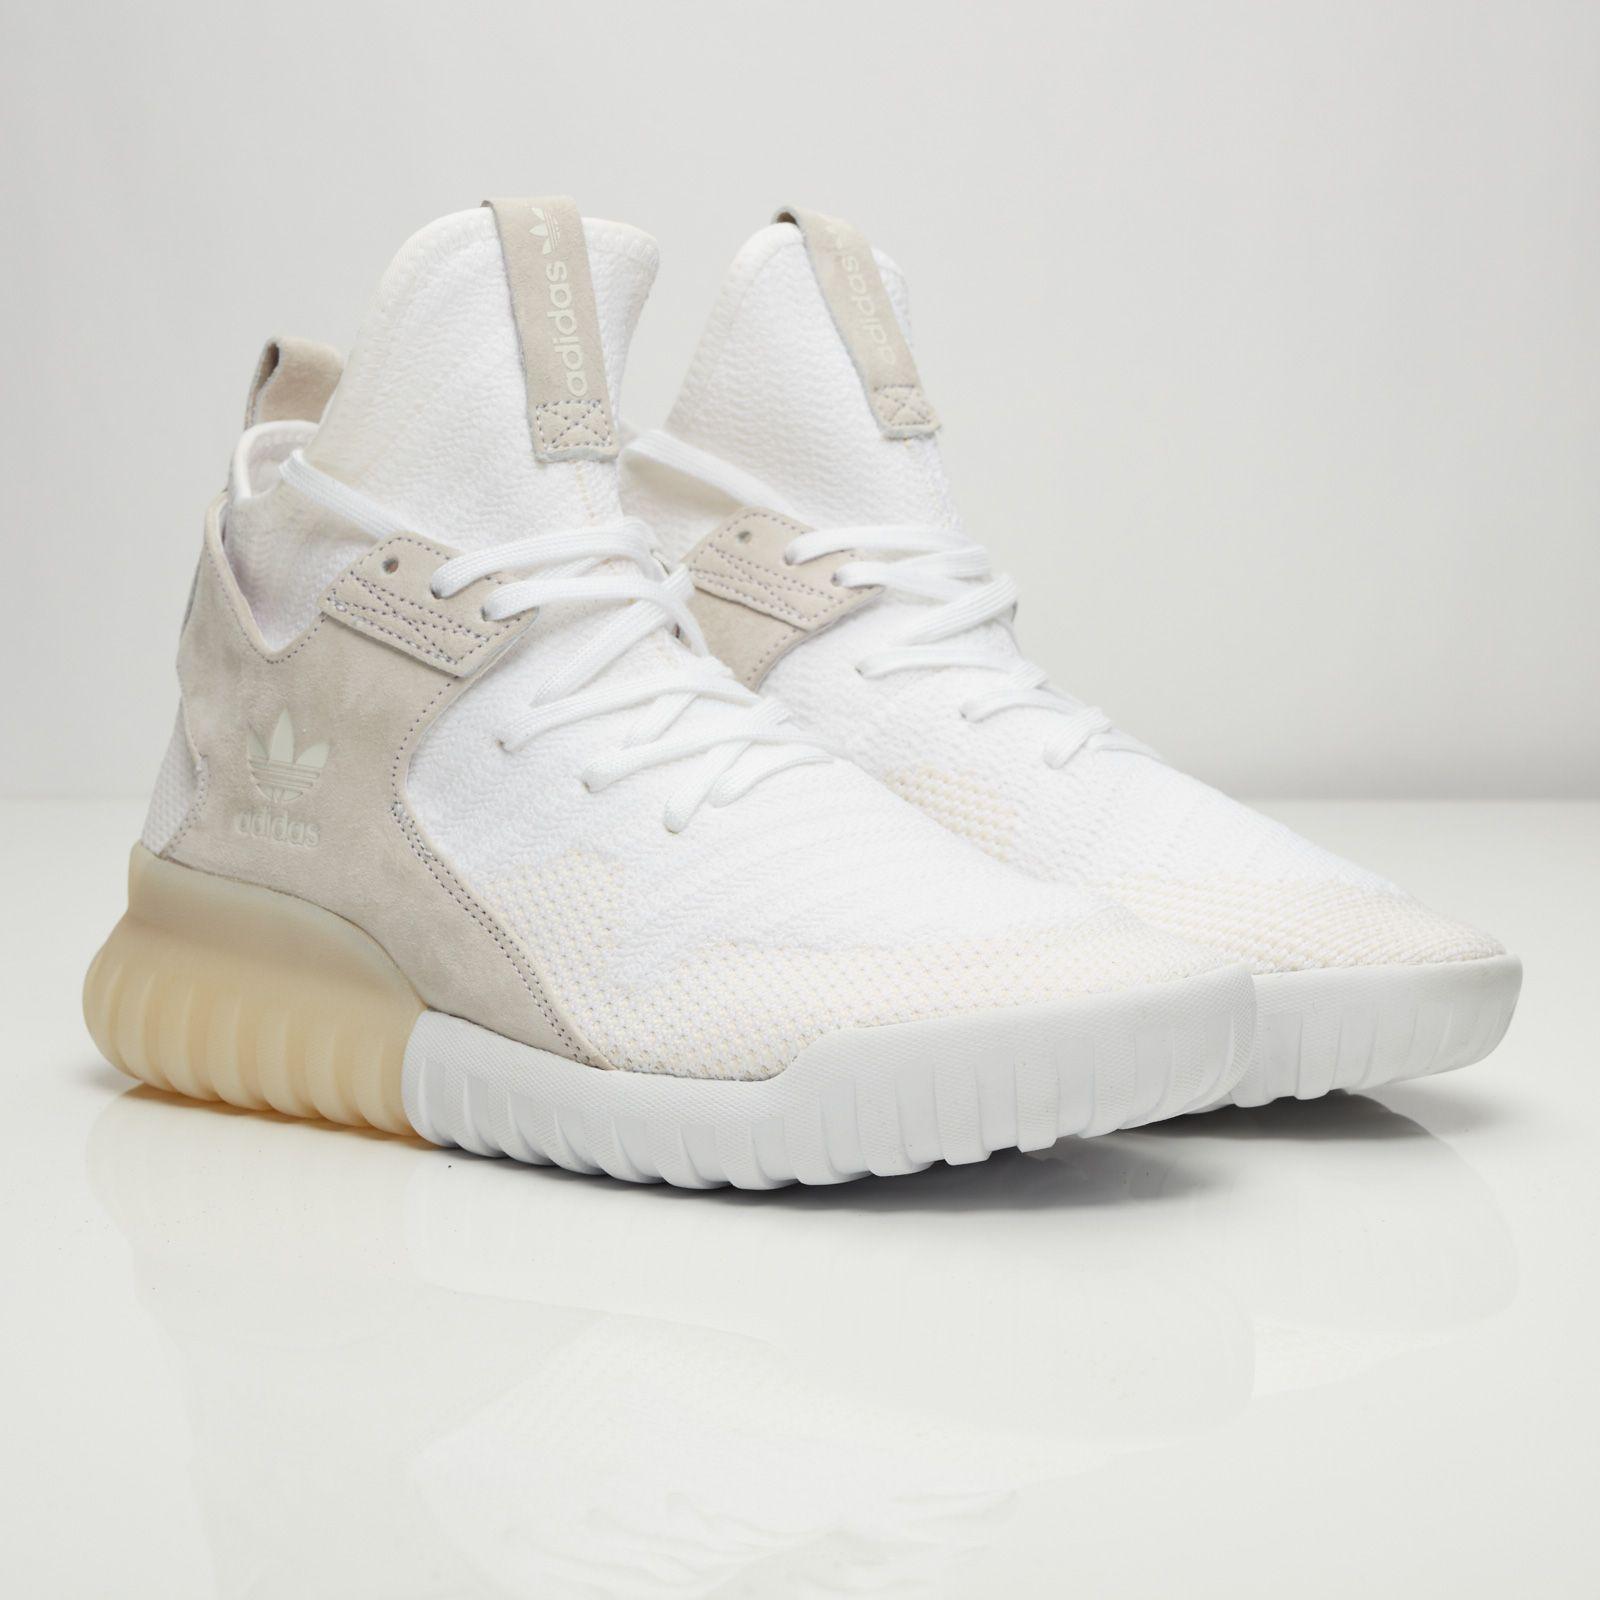 sale retailer 5e623 1b012 adidas Tubular X Primeknit. adidas Tubular X Primeknit Streetwear Online,  All White Party, Street Style Looks, Shoes